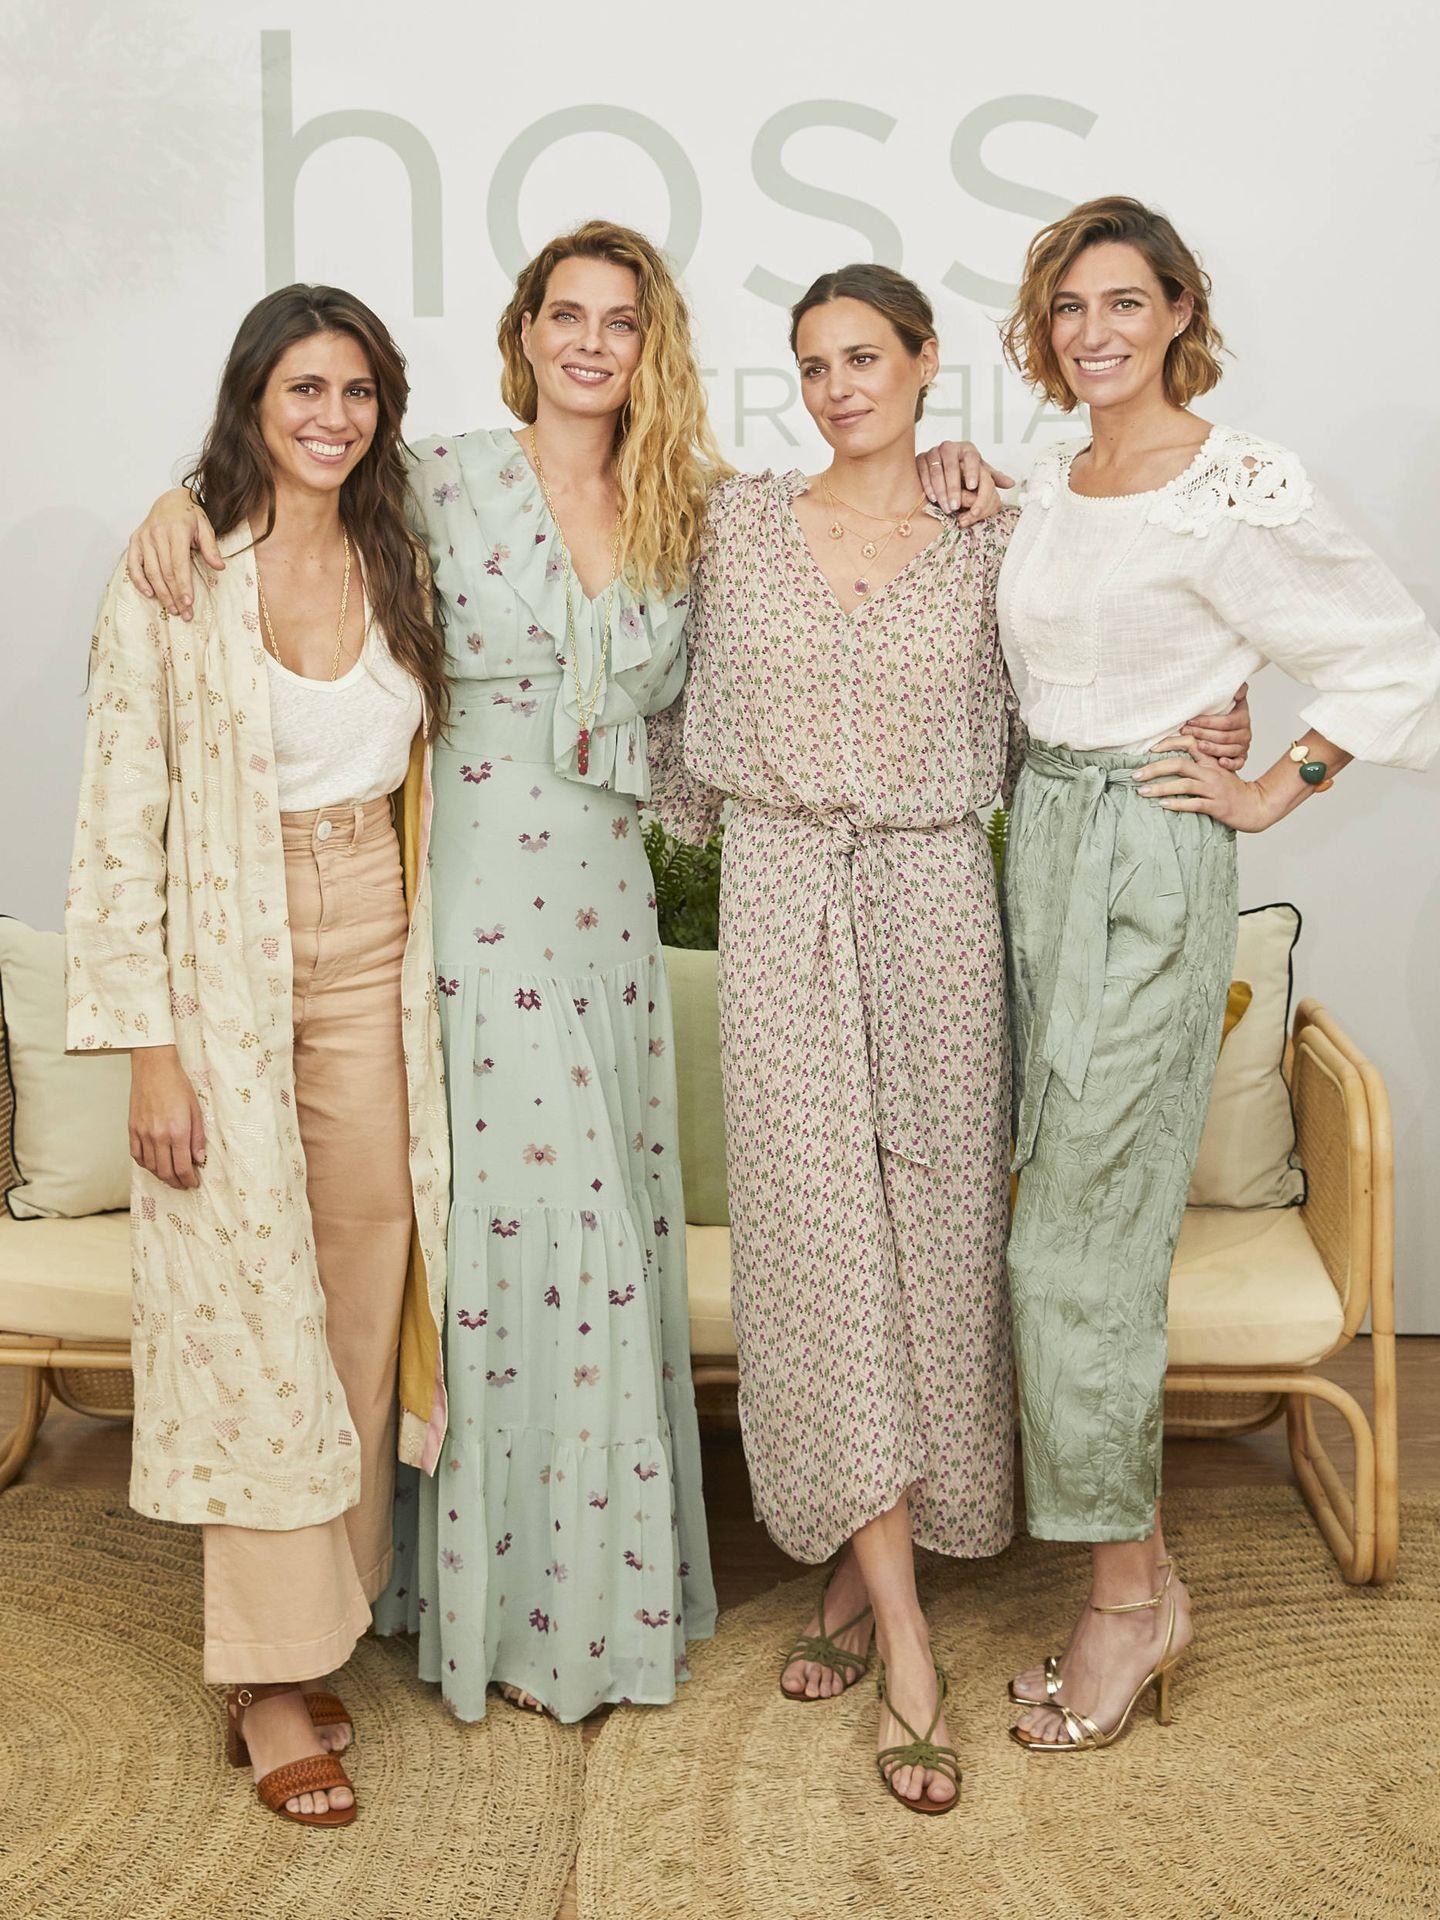 Las cuatro hermanas posan con looks de la firma. (Hoss Intropia)